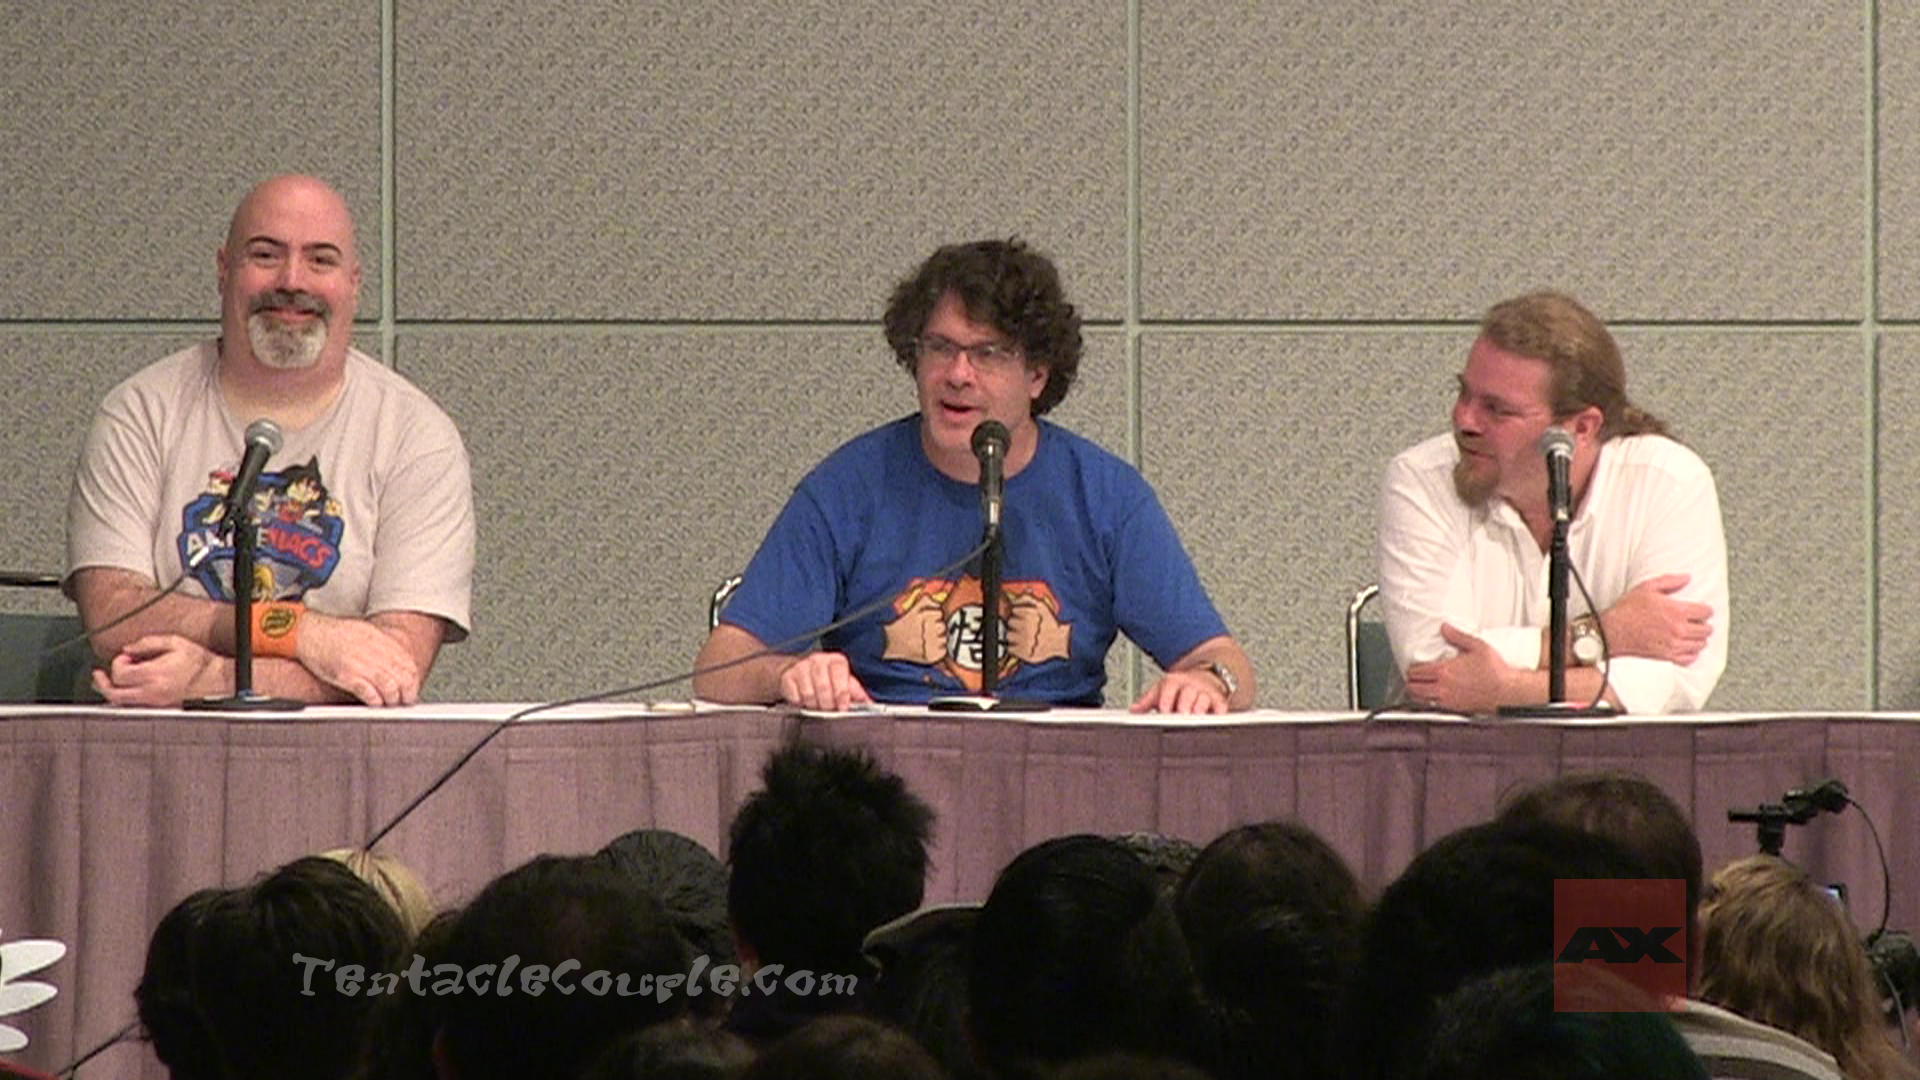 Dragon Ball Z: Battle of the Gods Panel